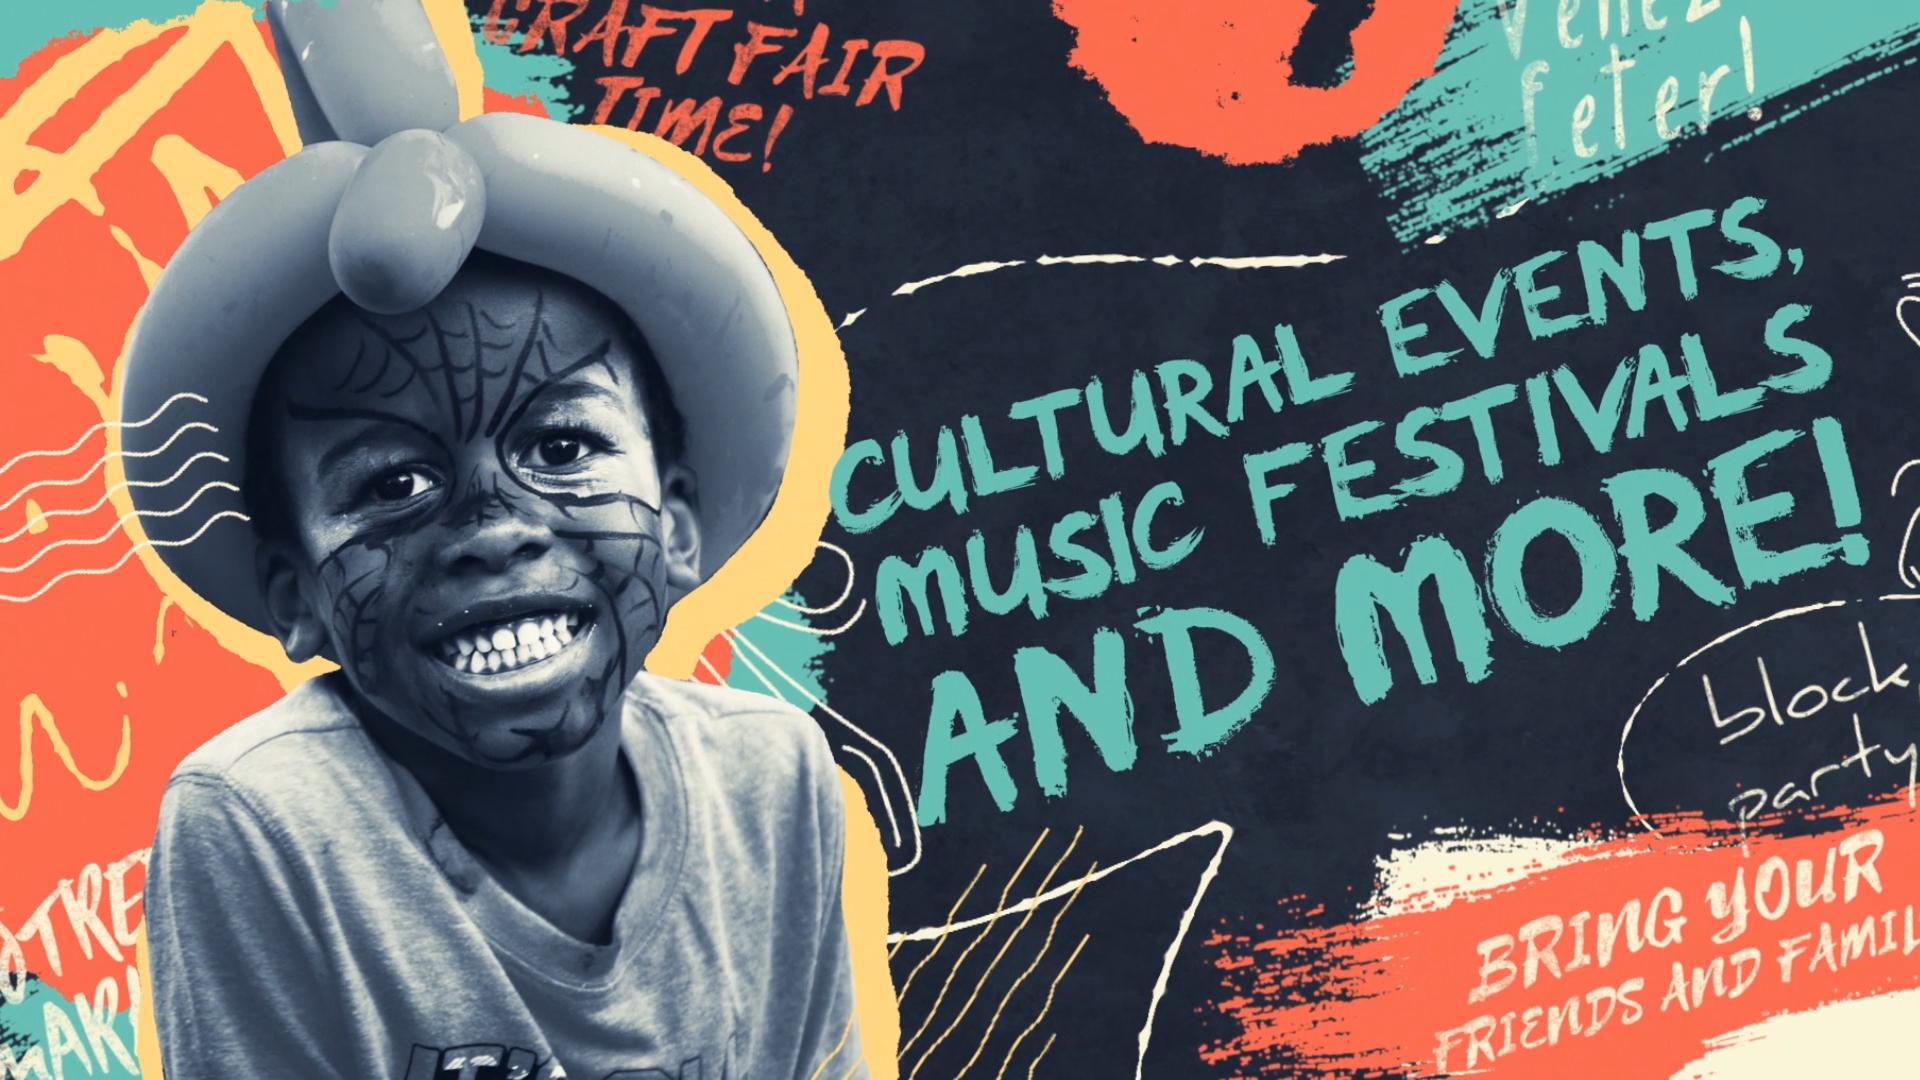 Ethnic_Festival_Open_1080p_00677